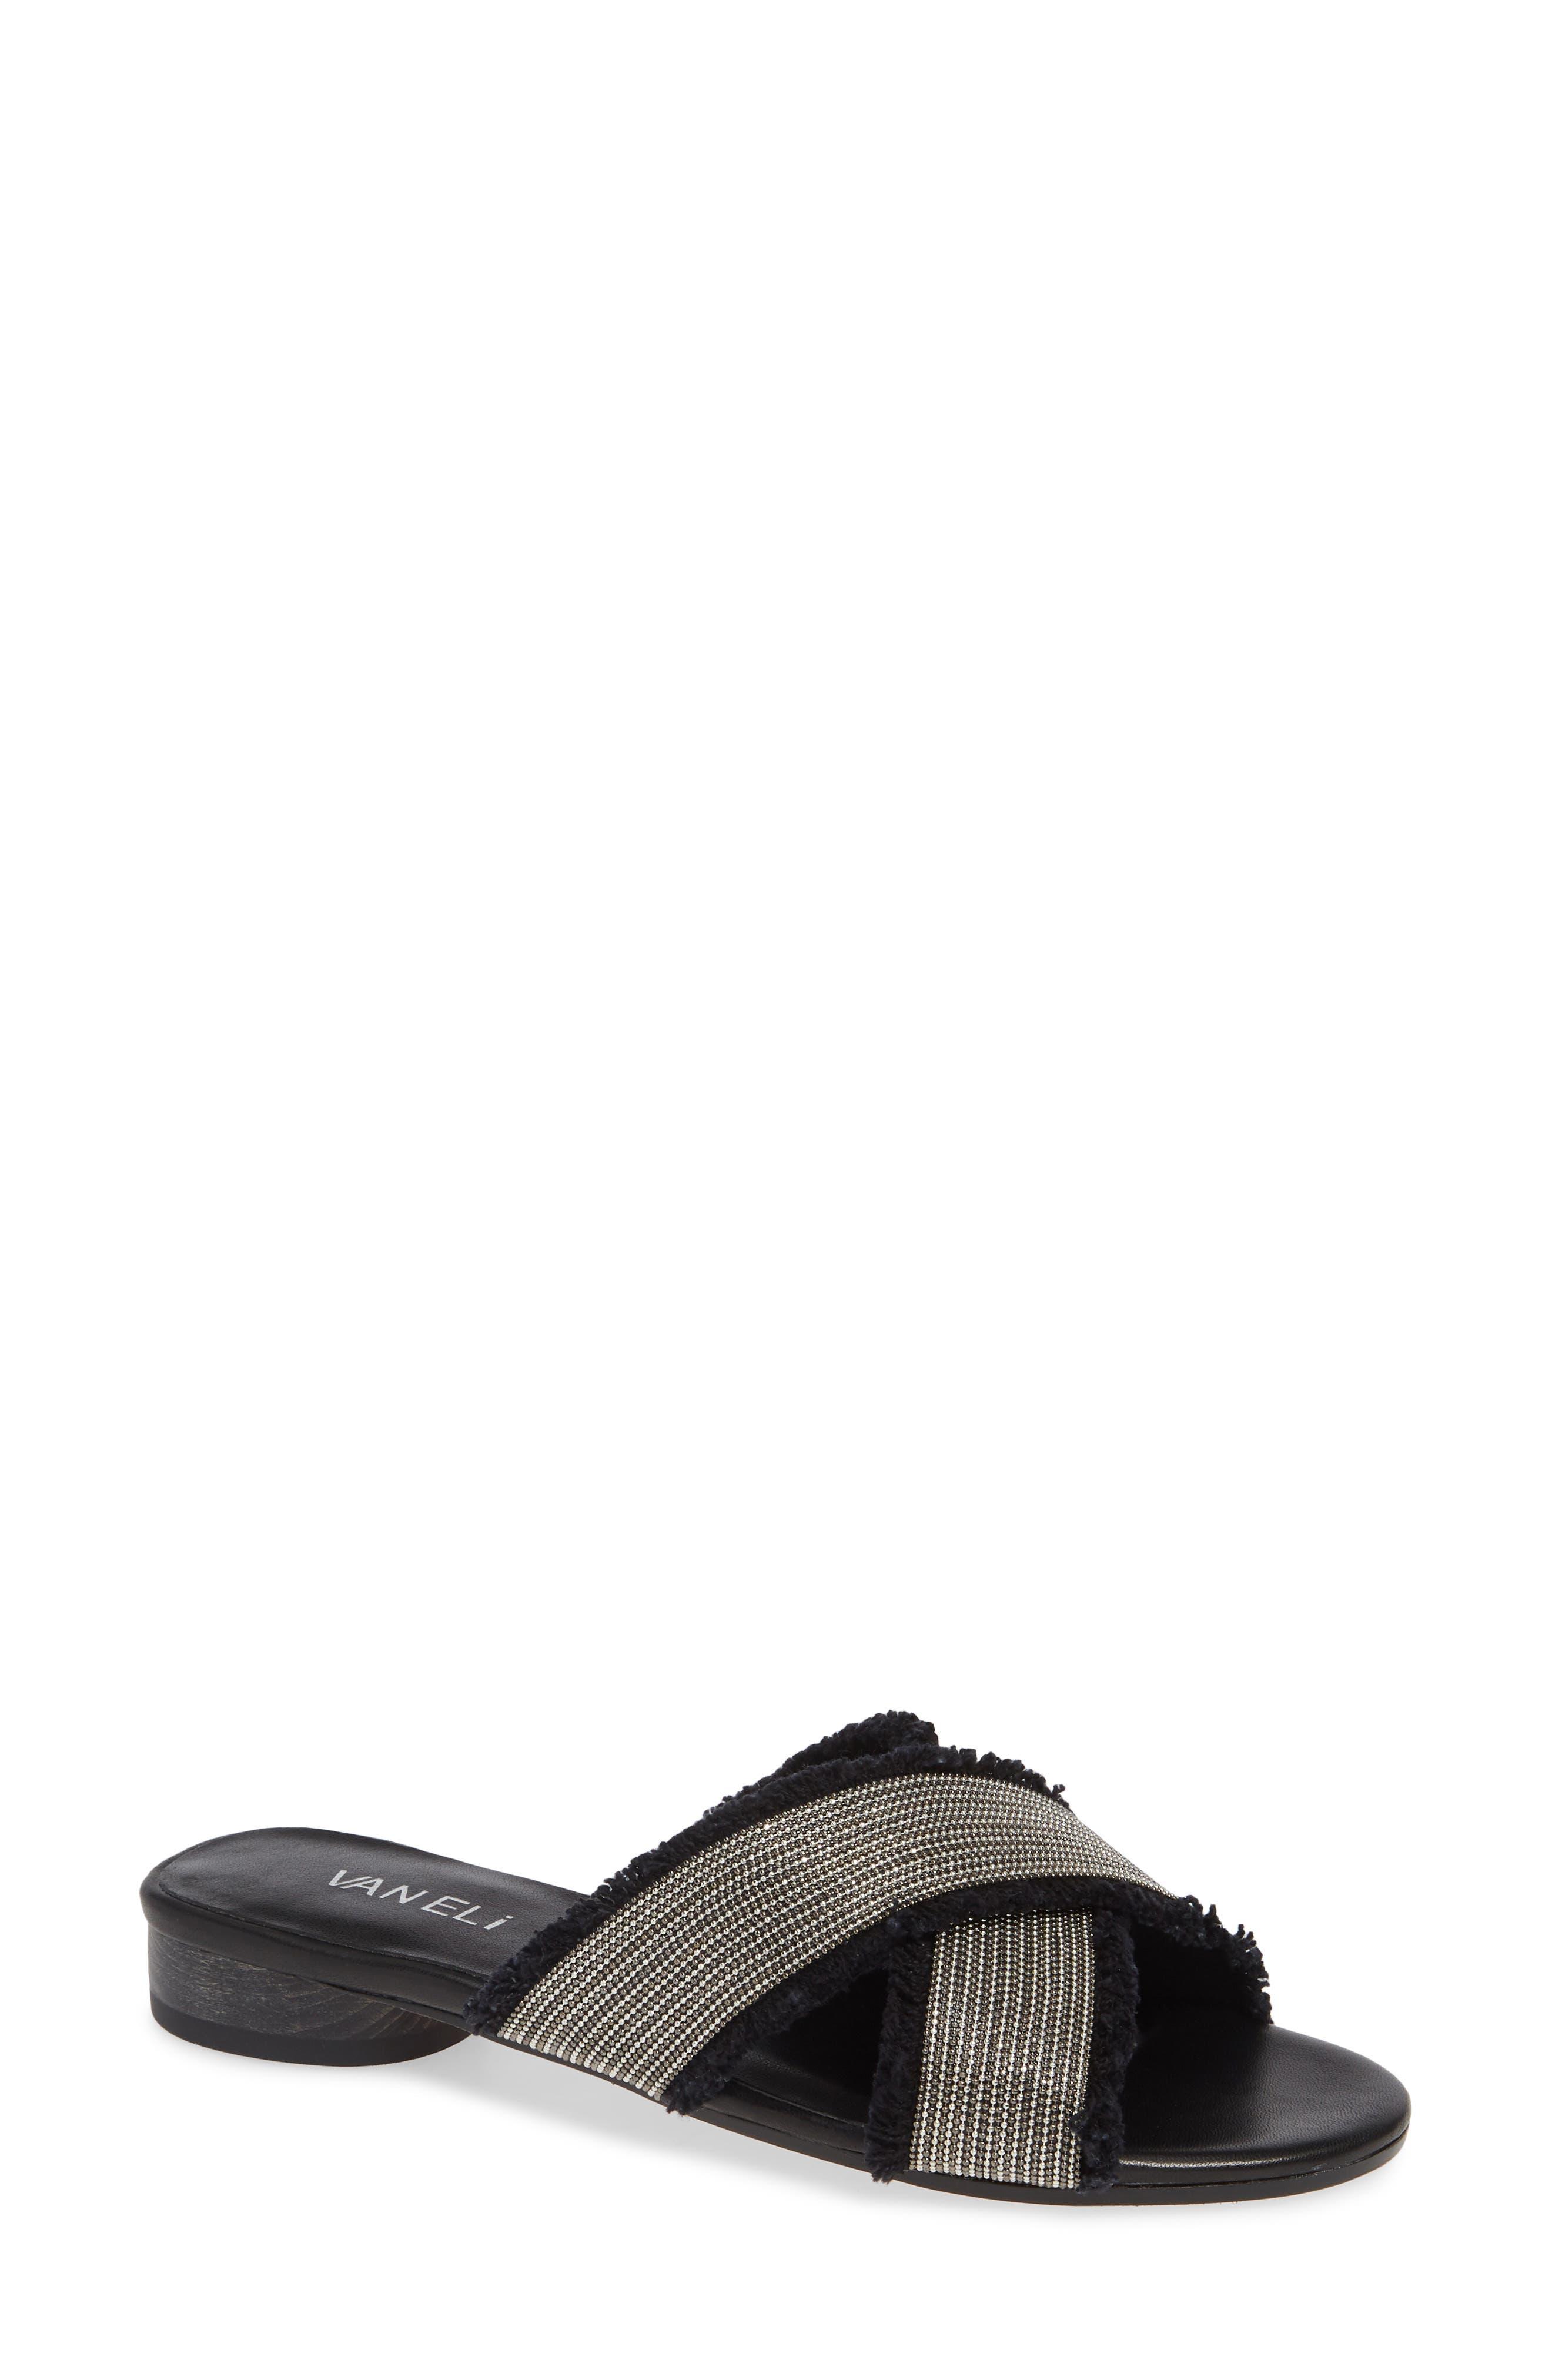 Baret Slide Sandal,                         Main,                         color, BLACK FABRIC